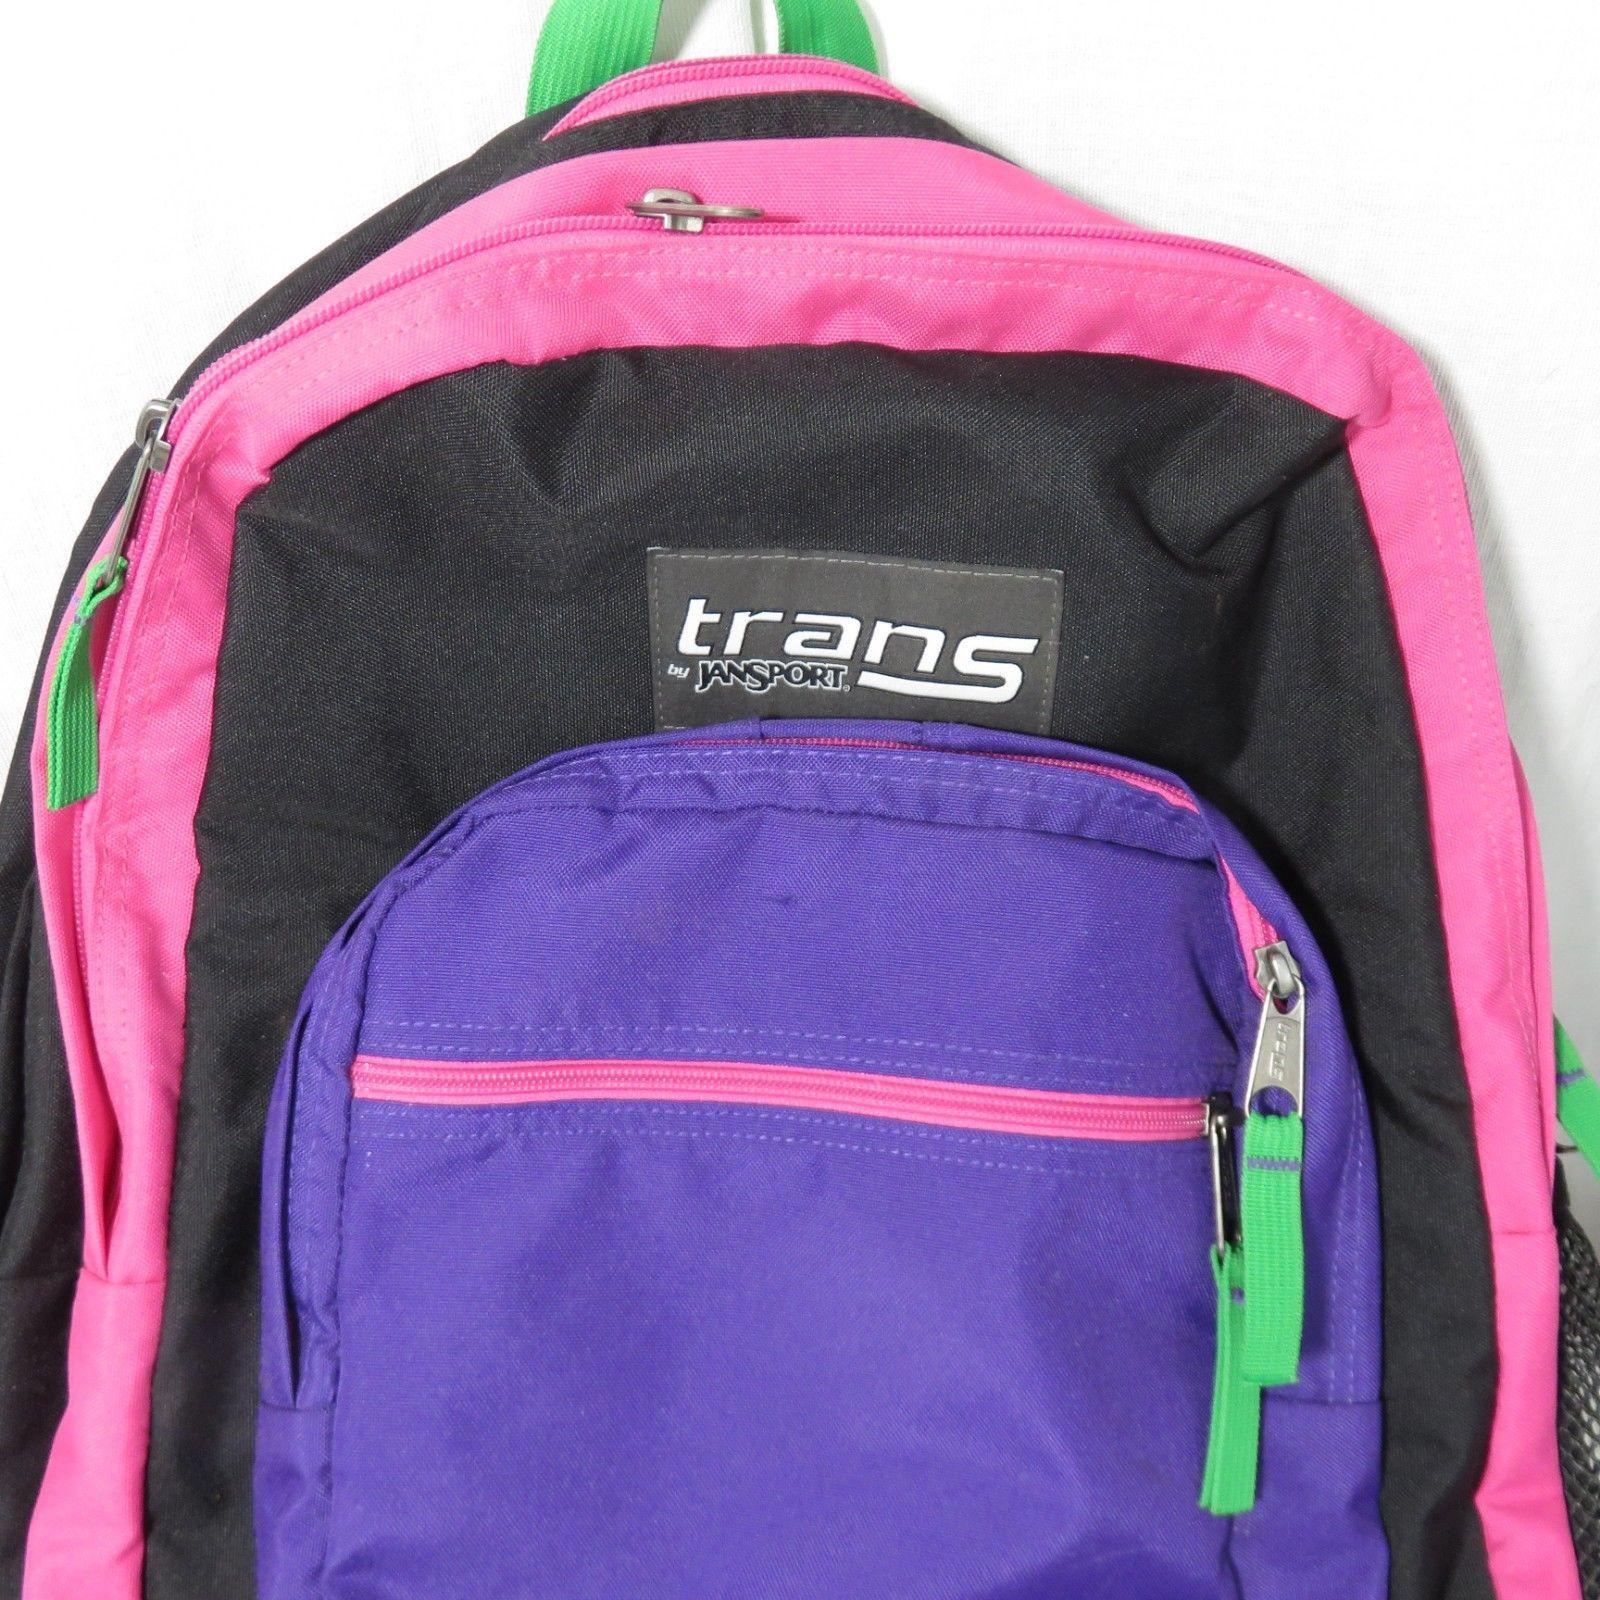 Trans Jansport Bright Multi Colored Backpack Black Neon Pink Purple